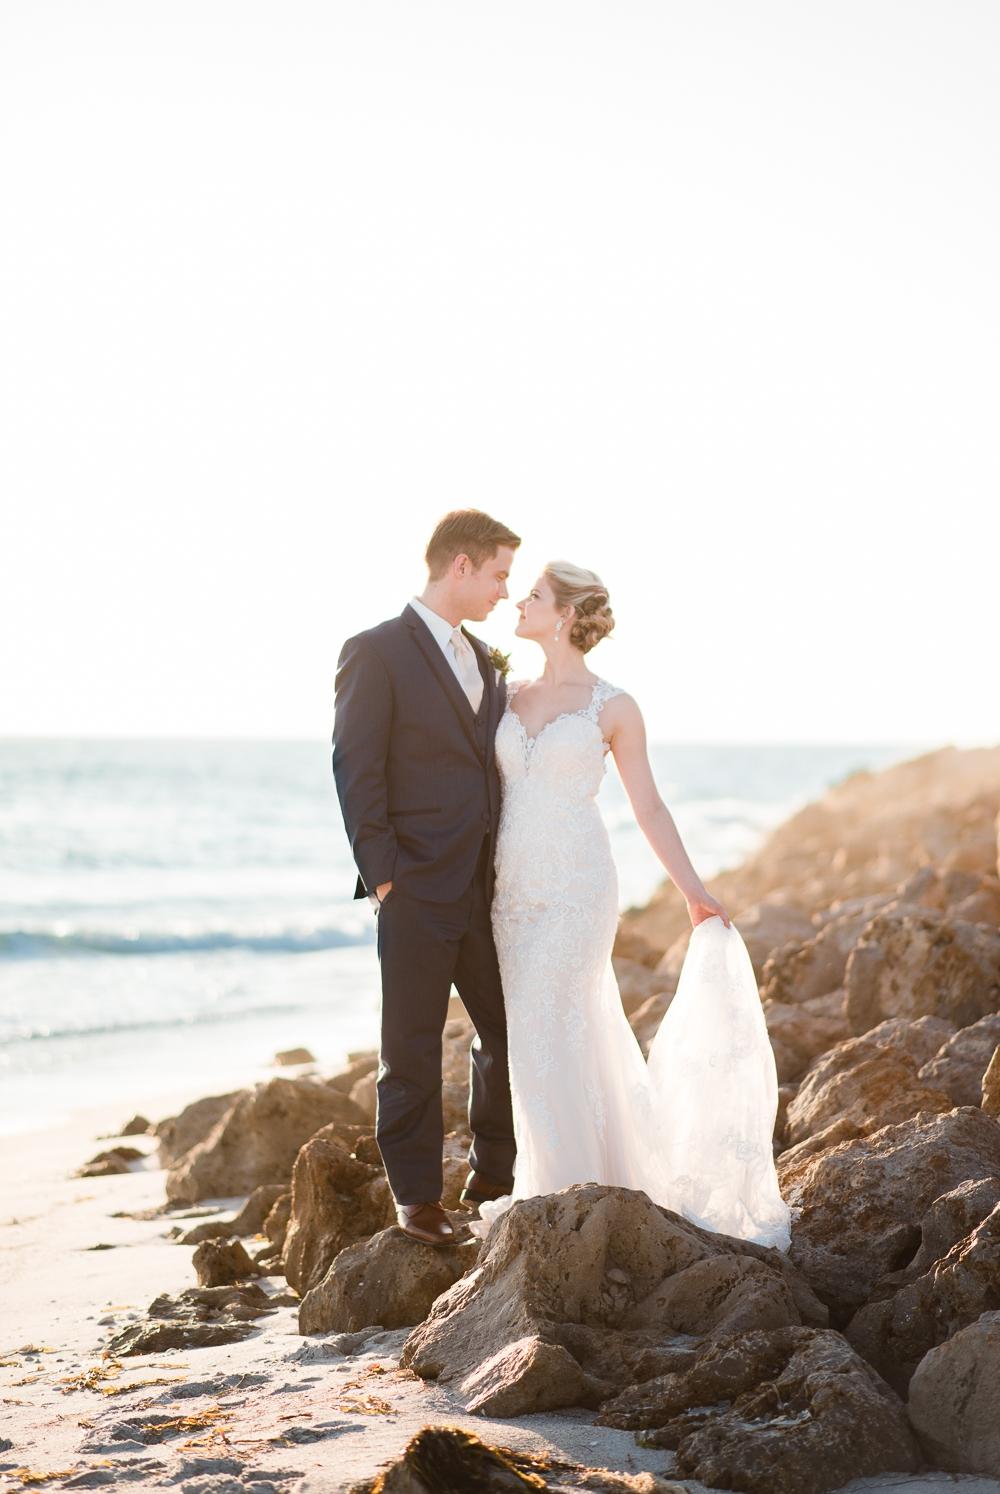 2016 HLM Wedding Beach Shoot 9.jpg